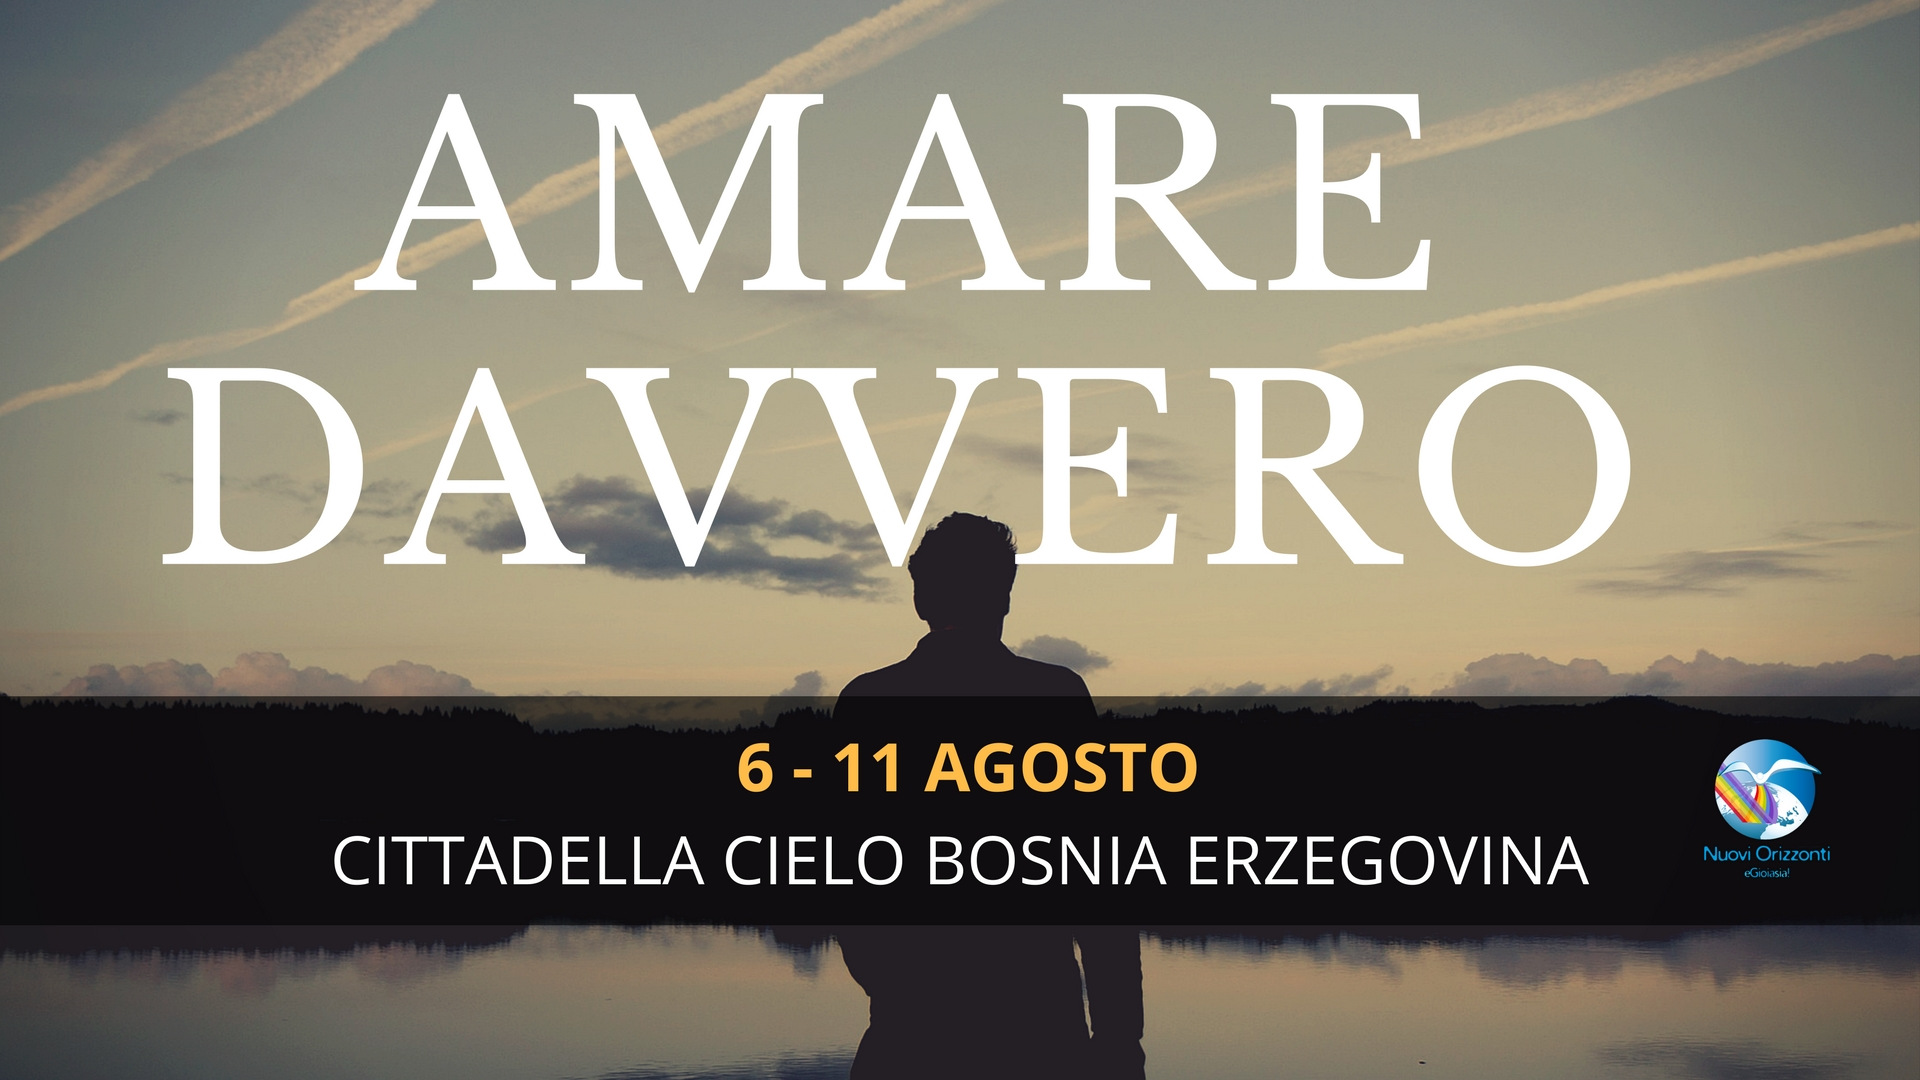 Amare Davvero Bosnia Erzegovina - Nuovi Orizzonti